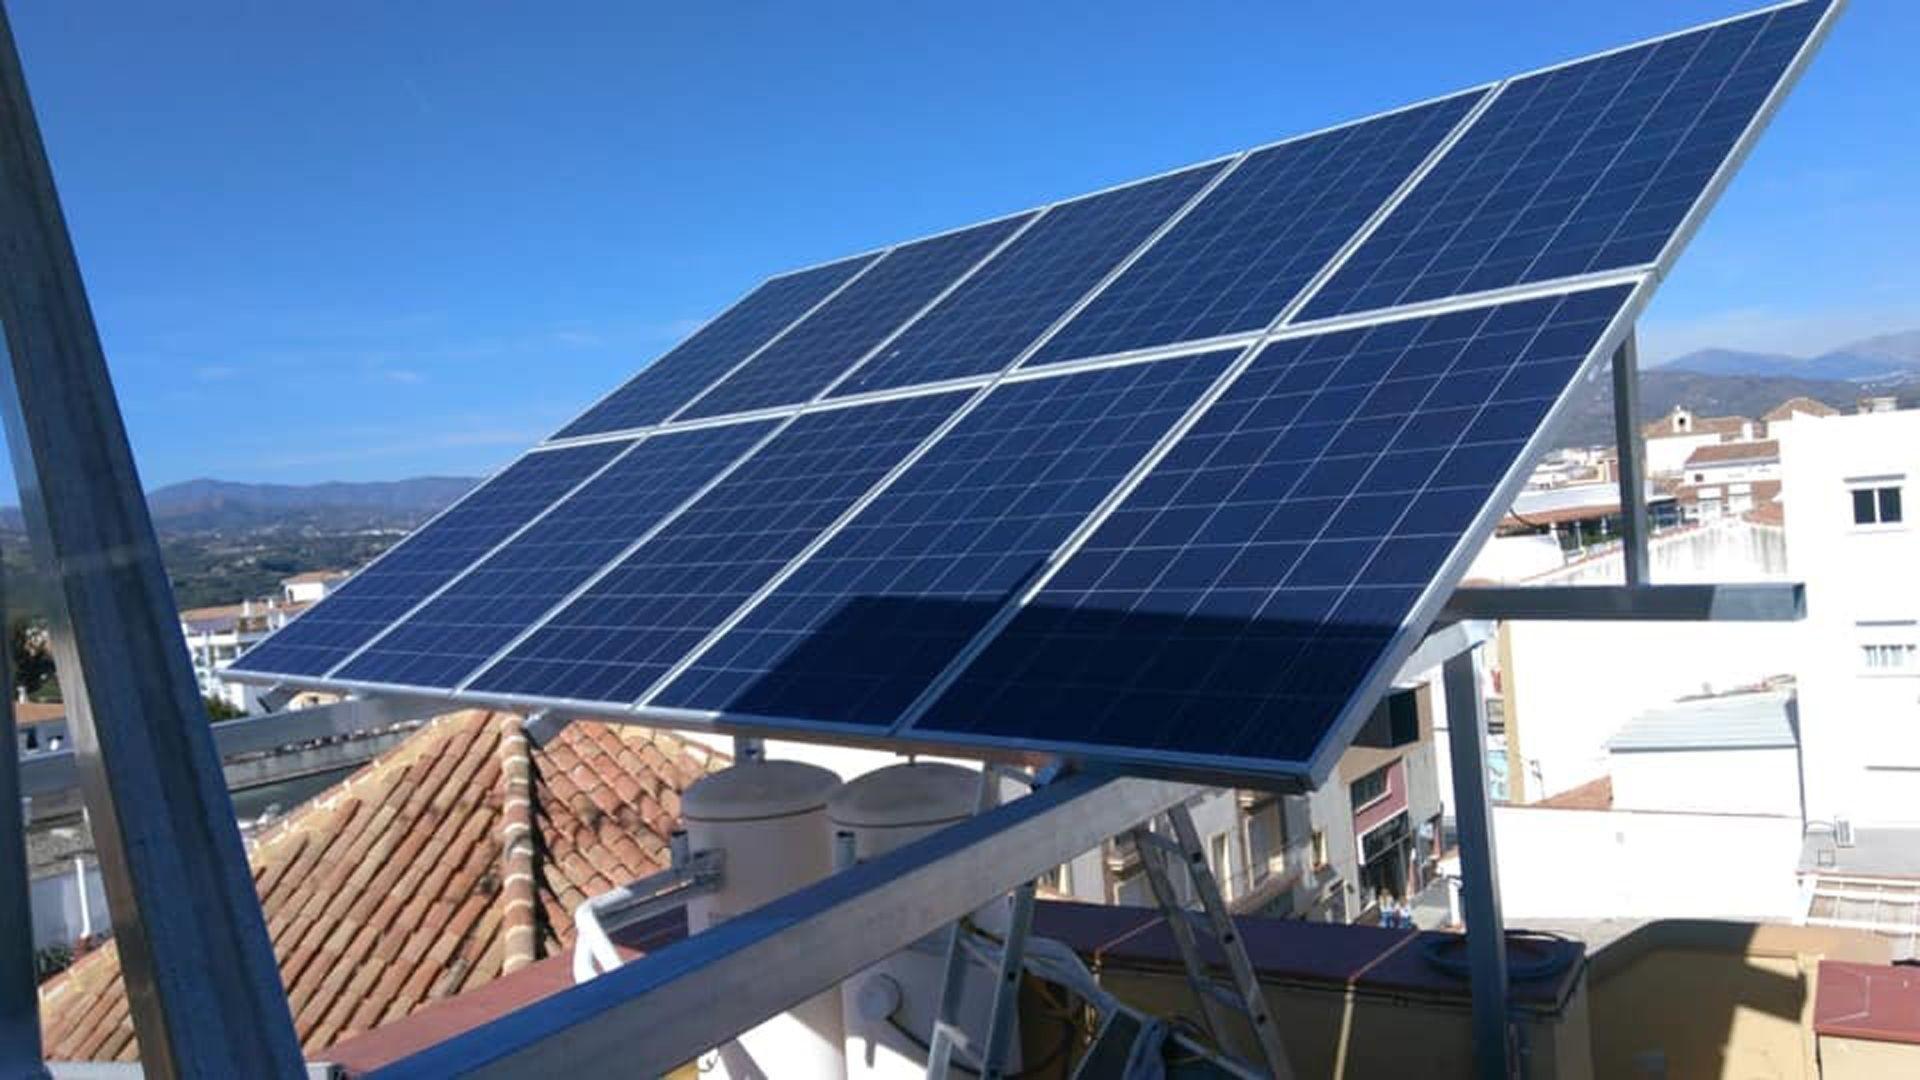 Empresa instaladora de energías renovables en Málaga